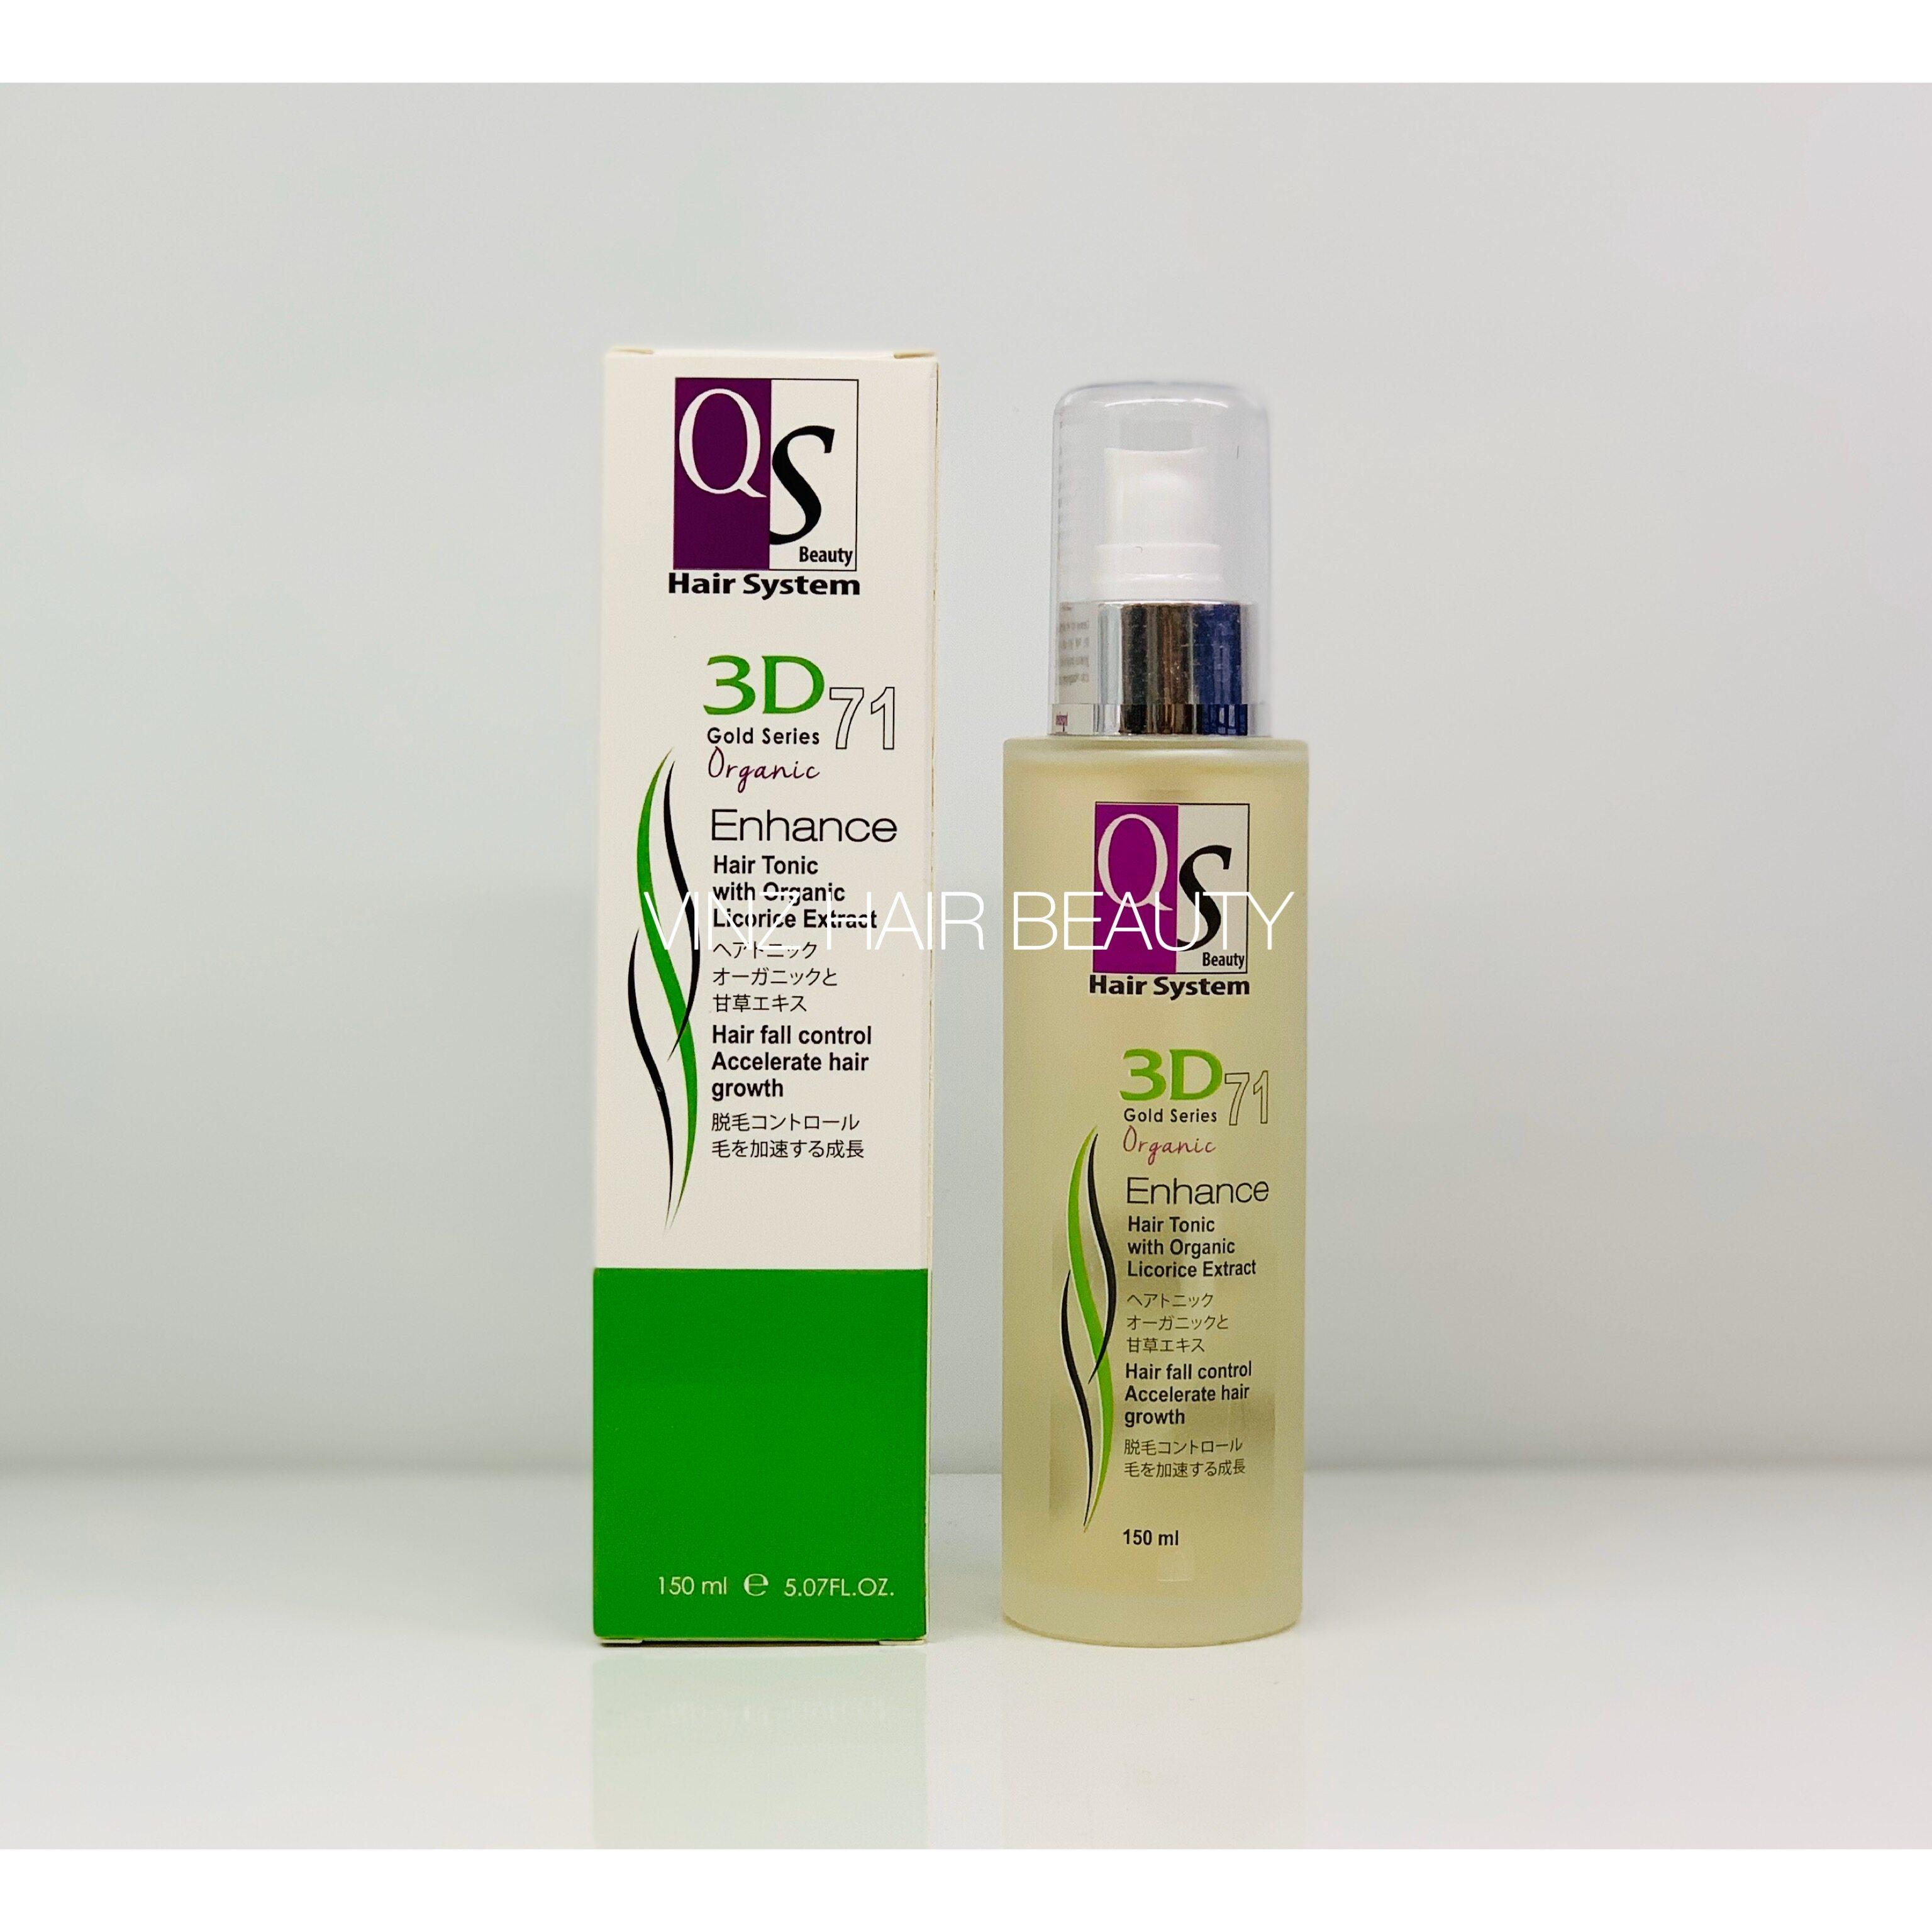 QS 3D71 Organic Enhance Hair Tonic 150ml